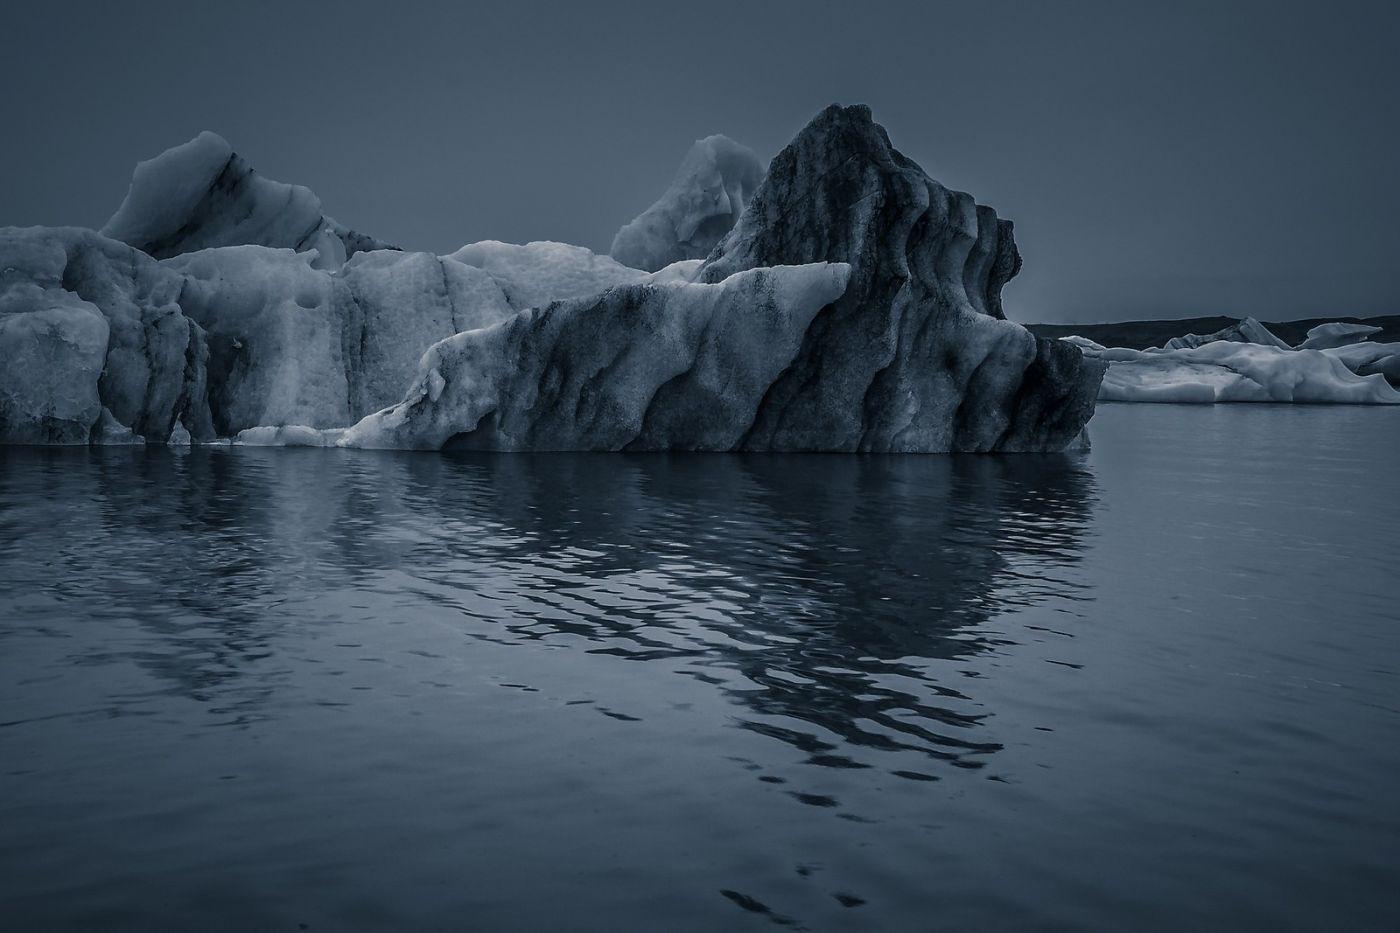 冰岛冰川泻湖(Glacier Lagoon),流动的冰川_图1-22